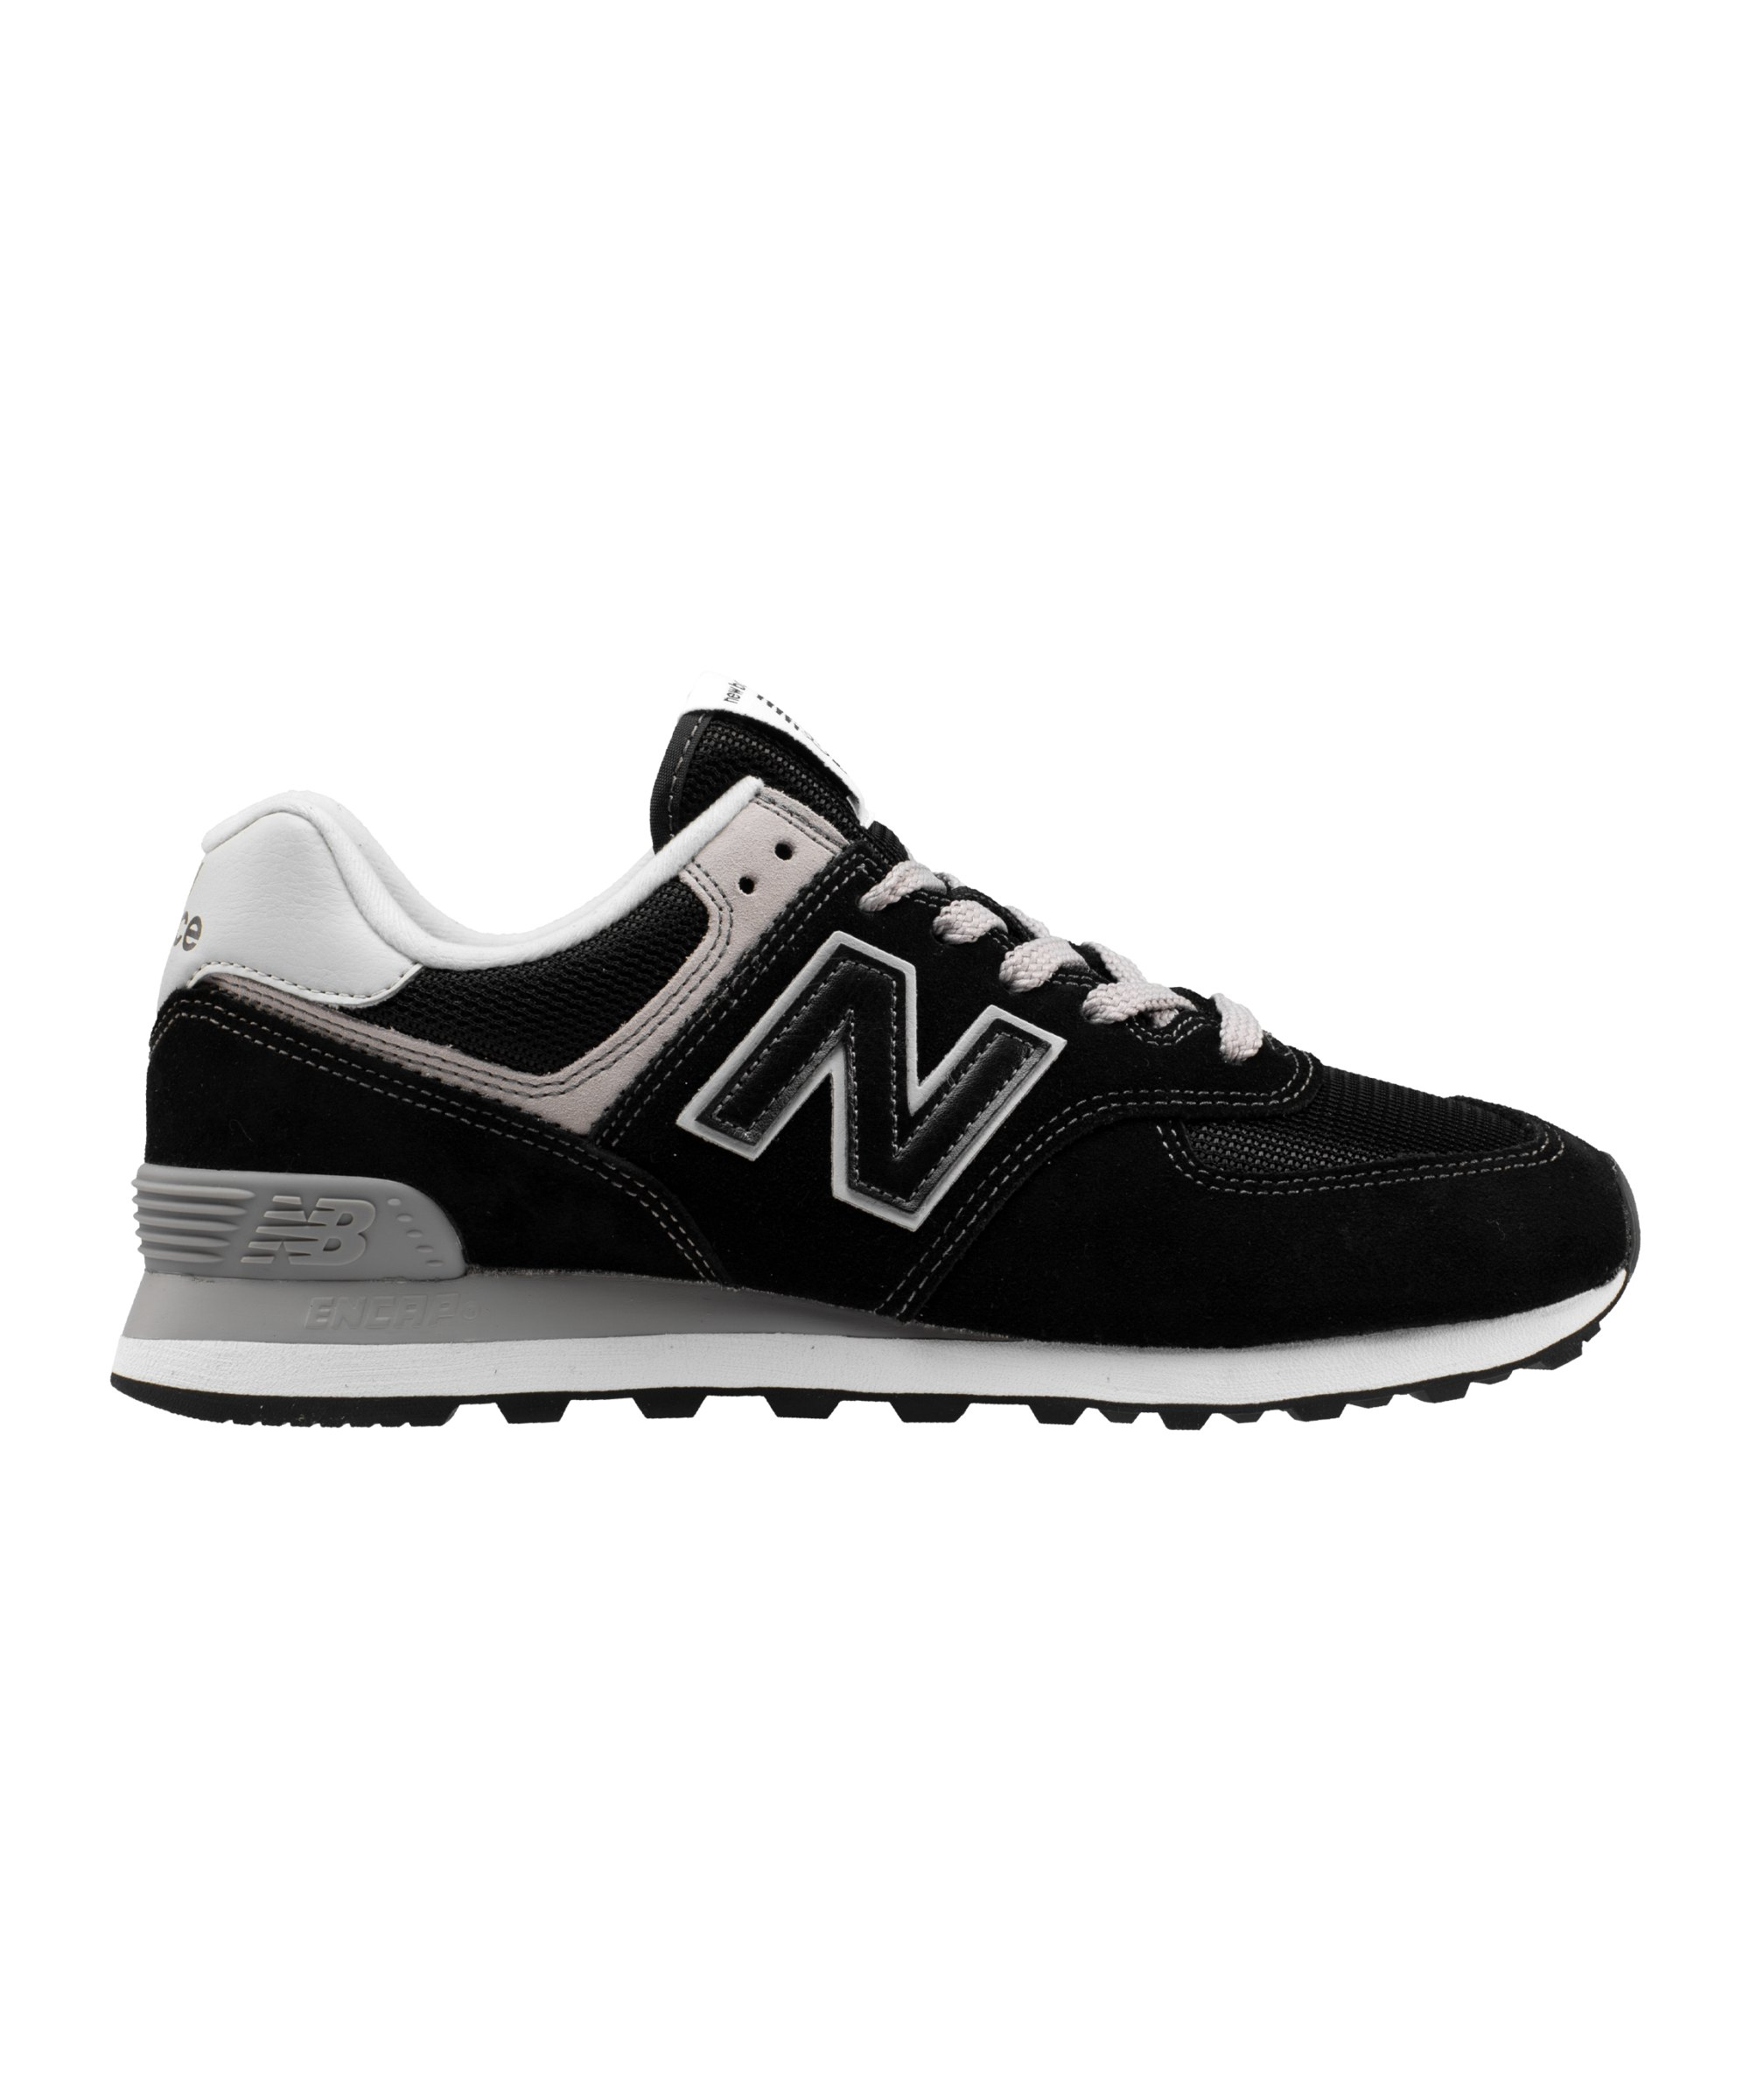 New Balance ML574 Sneaker Schwarz F122 - schwarz